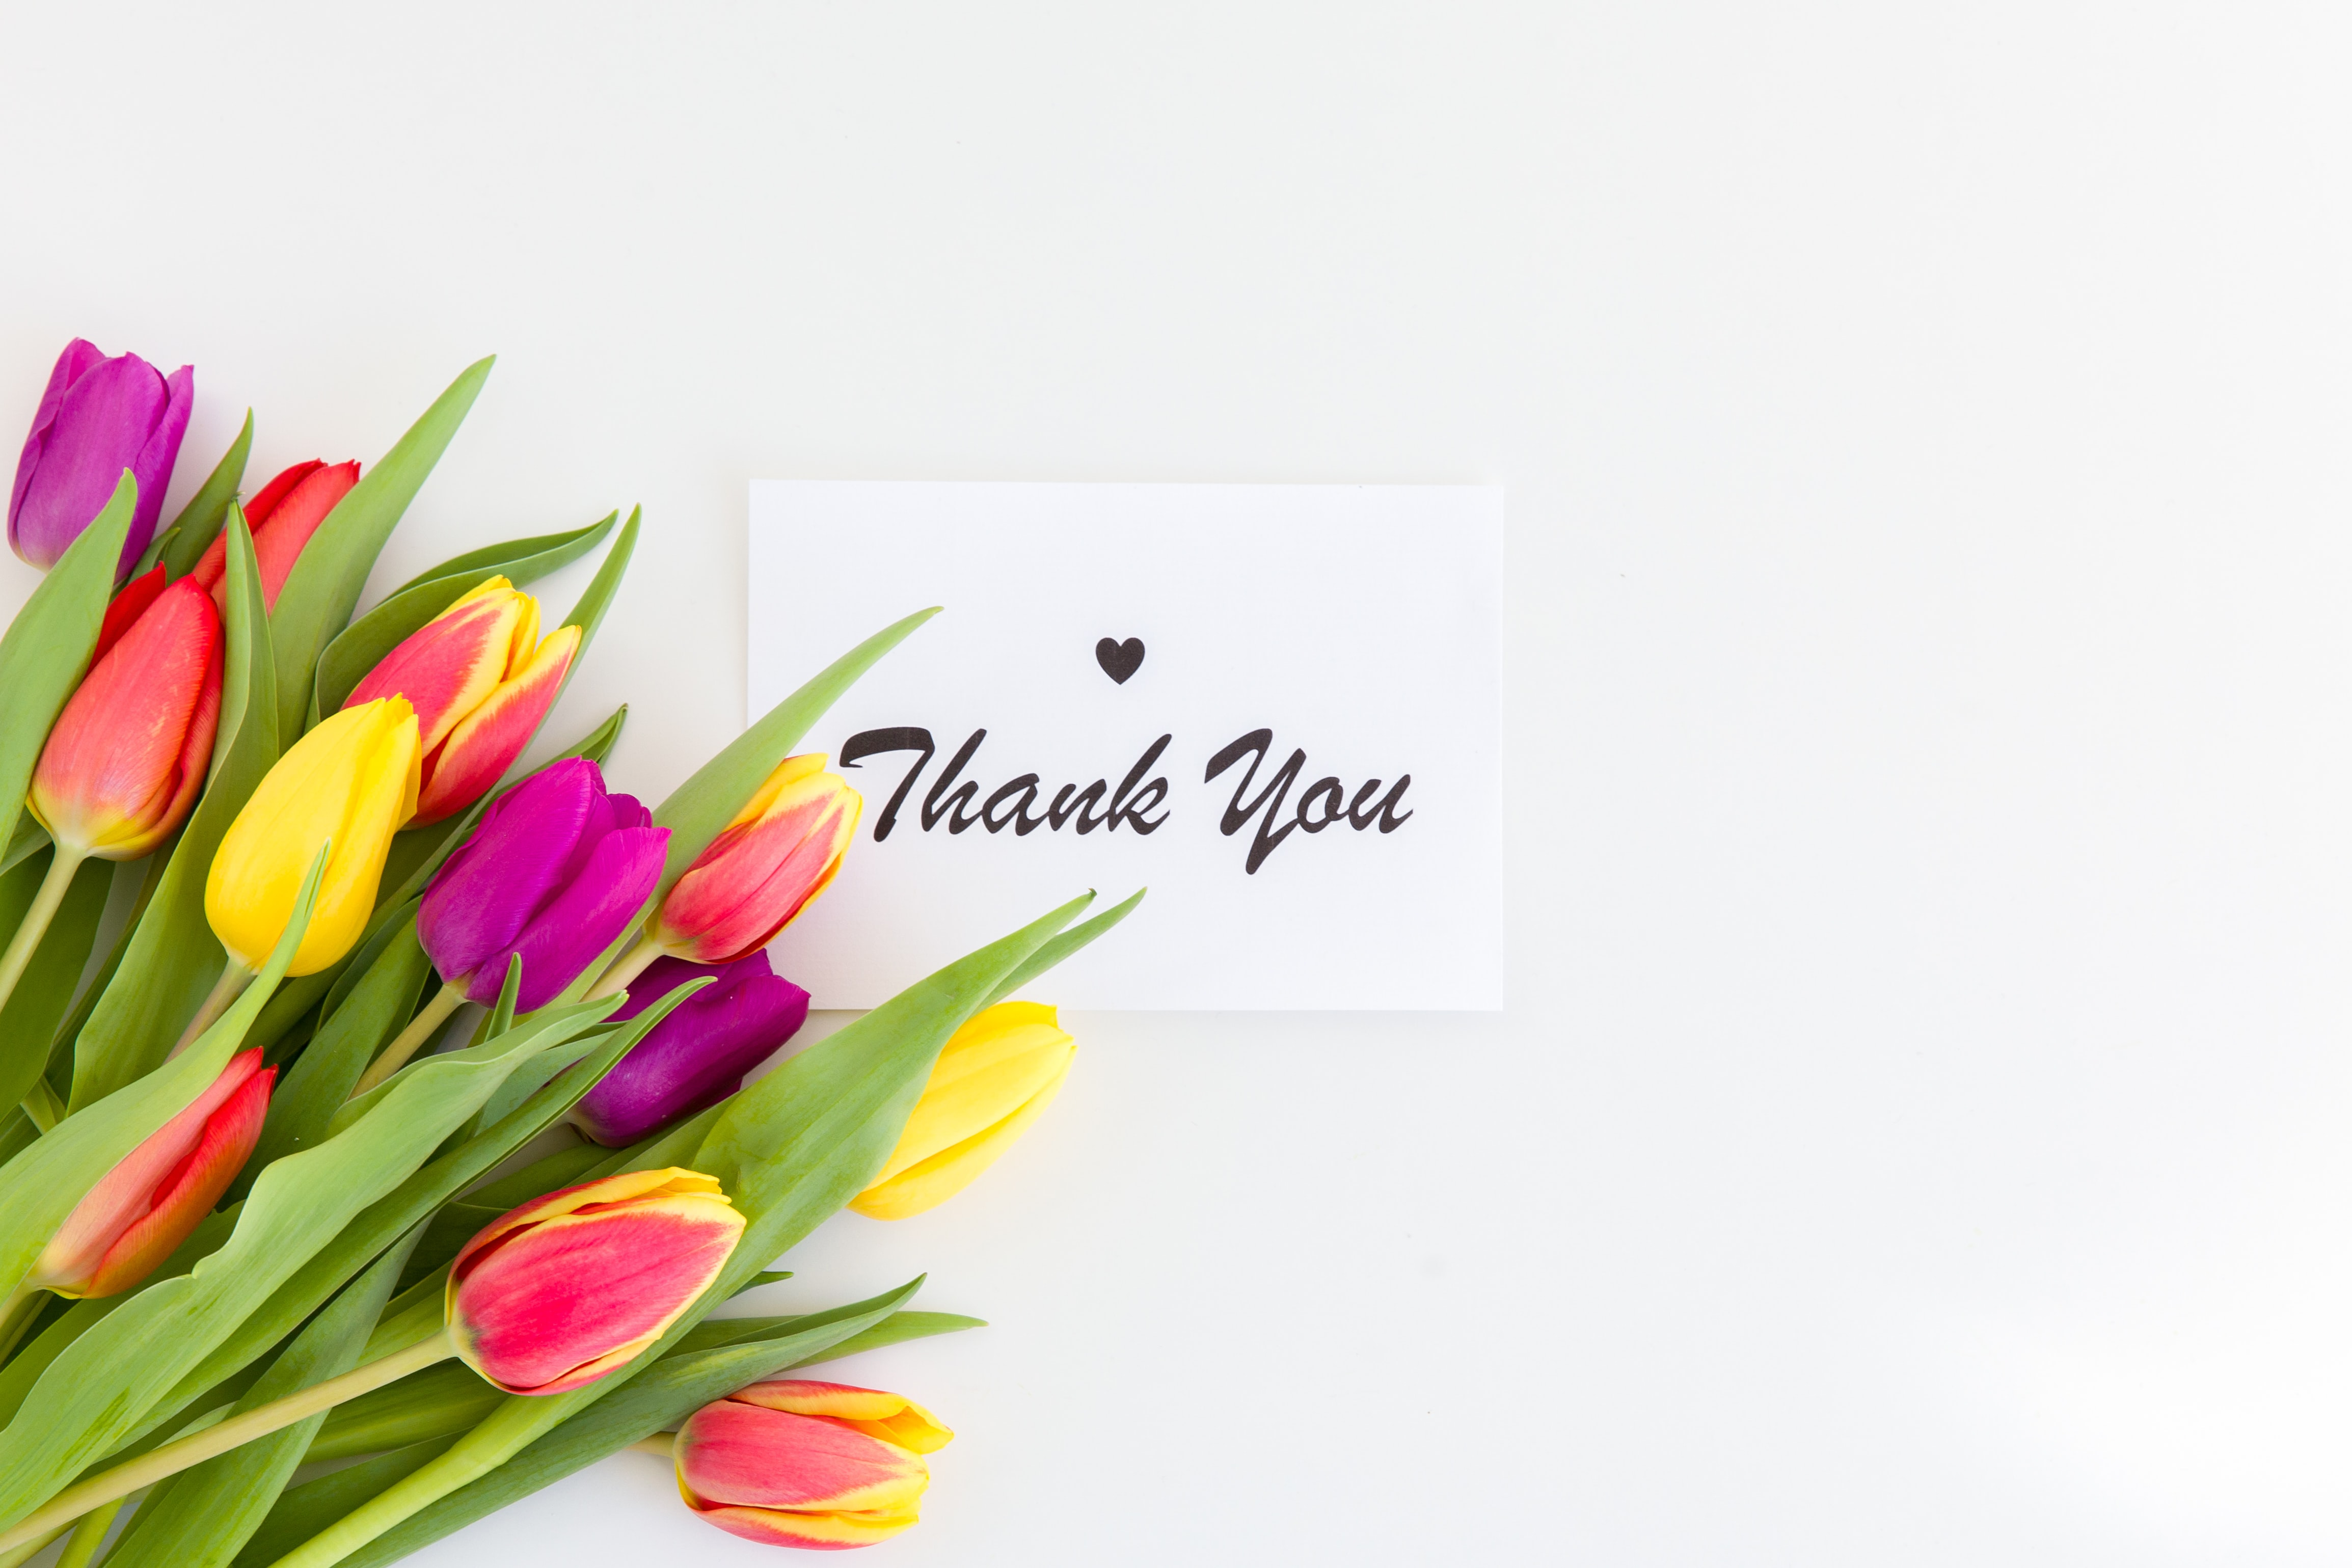 139815 descargar fondo de pantalla Las Palabras, Palabras, Gracias, Inscripción, Flores, Tulipanes: protectores de pantalla e imágenes gratis